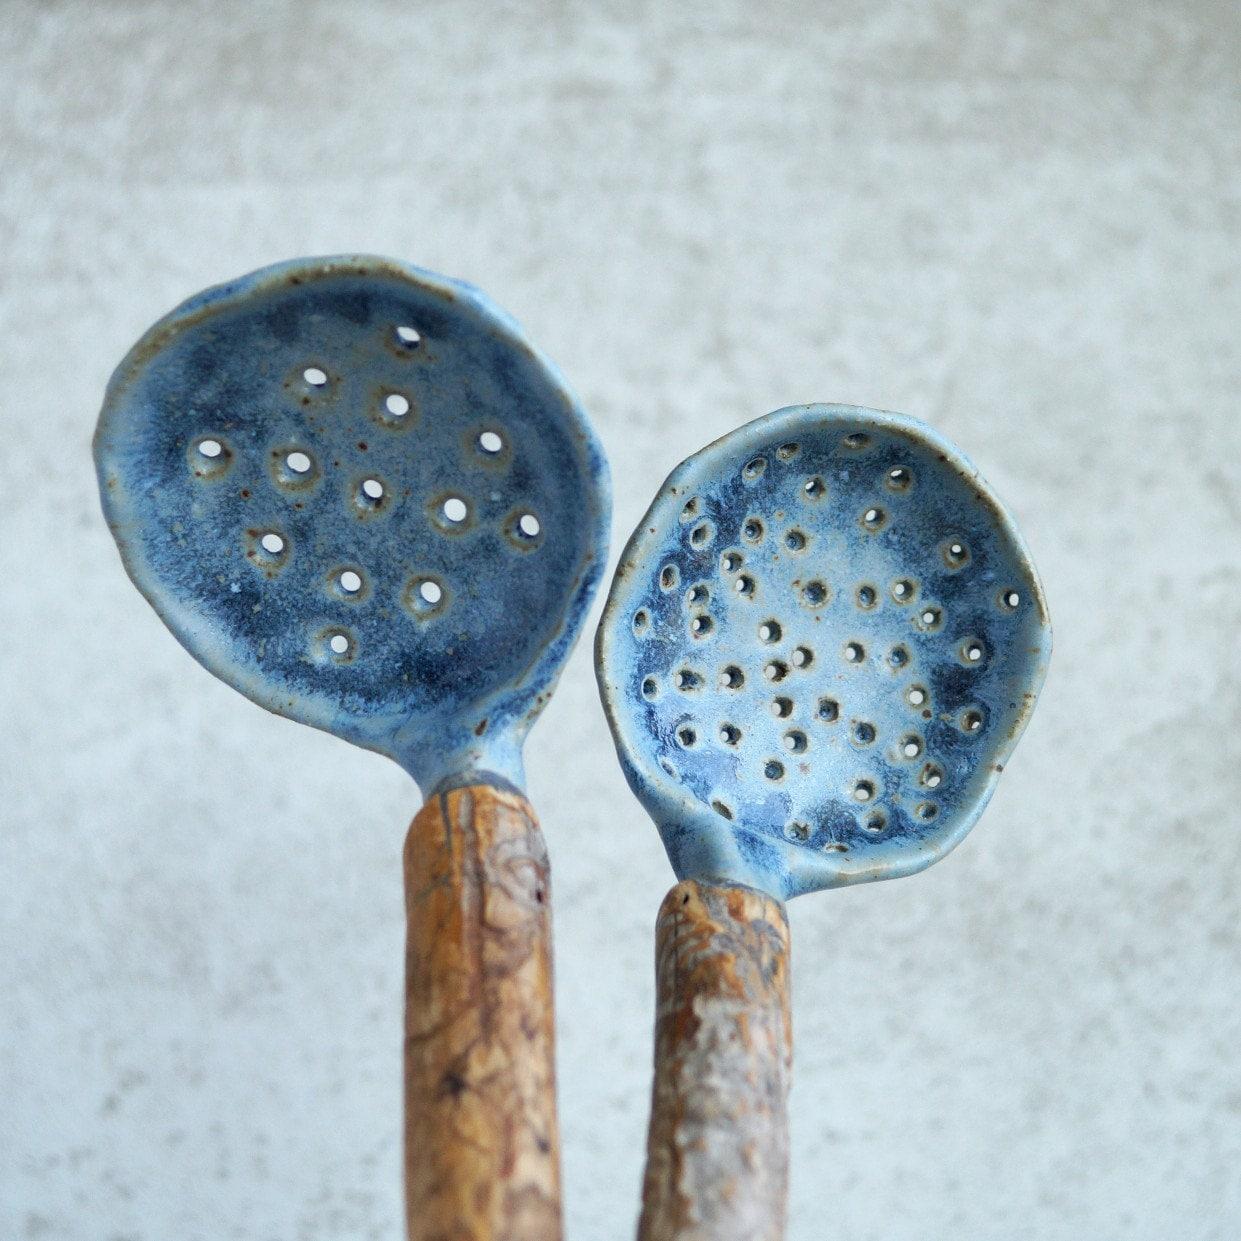 Handmade Ceramic Espumadera Real Wood Handle Ladle Rustic | Etsy